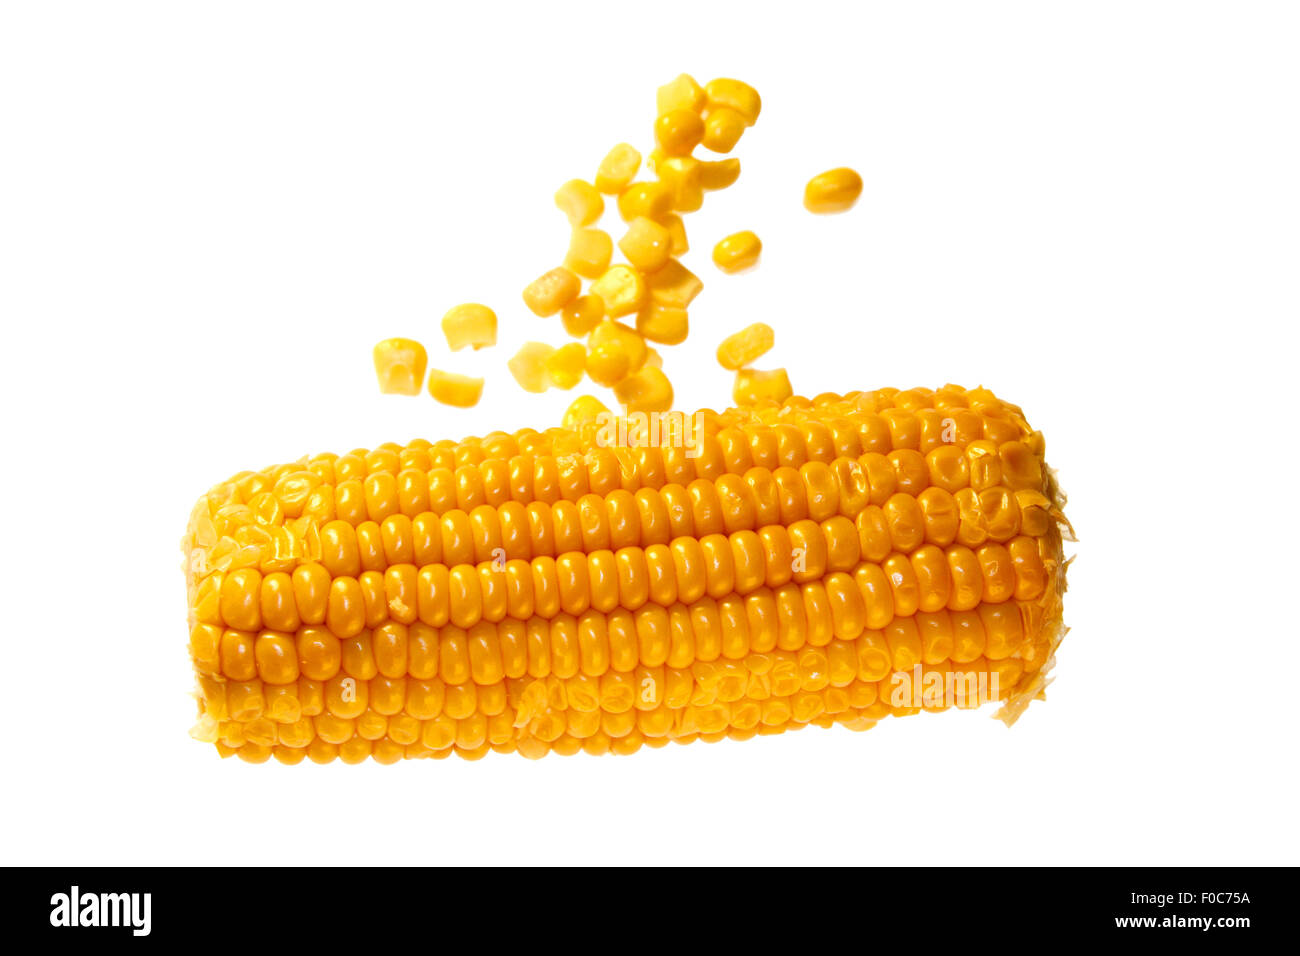 Maiskolben/ maize/ corn cob - Symbolbild Nahrungsmittel. Stock Photo